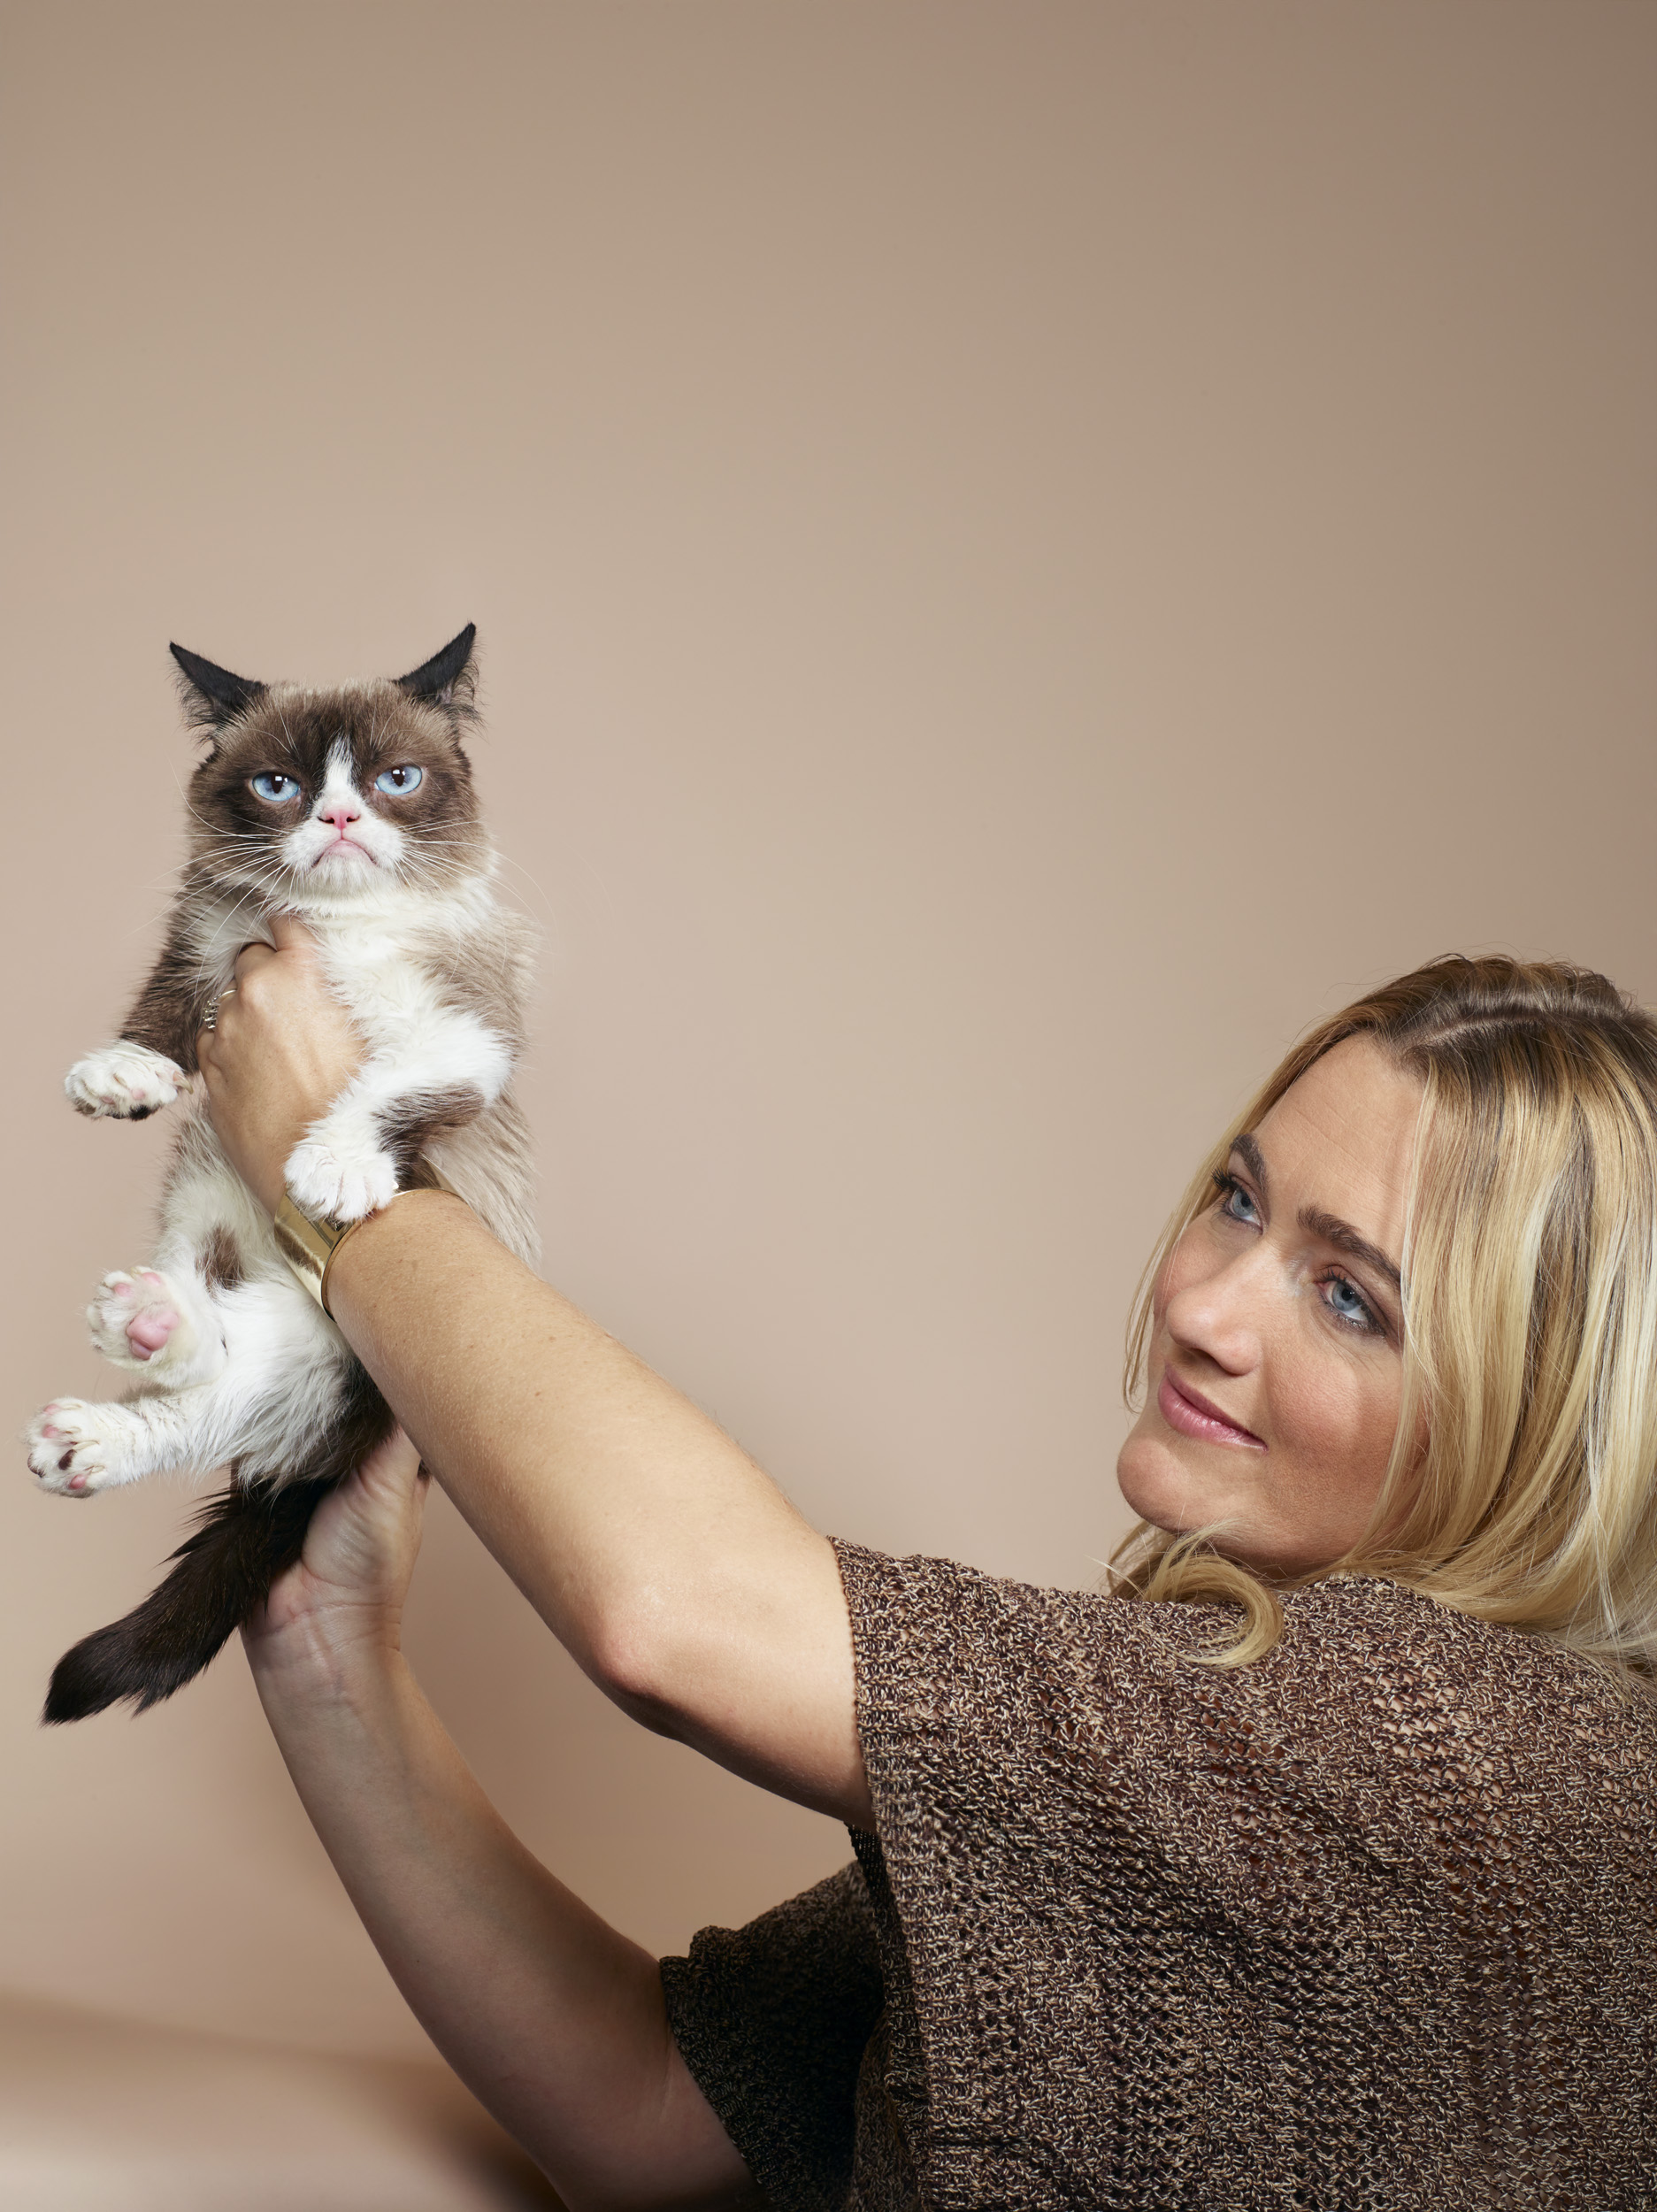 The Grumpy Cat, with Tabatha Bundesen